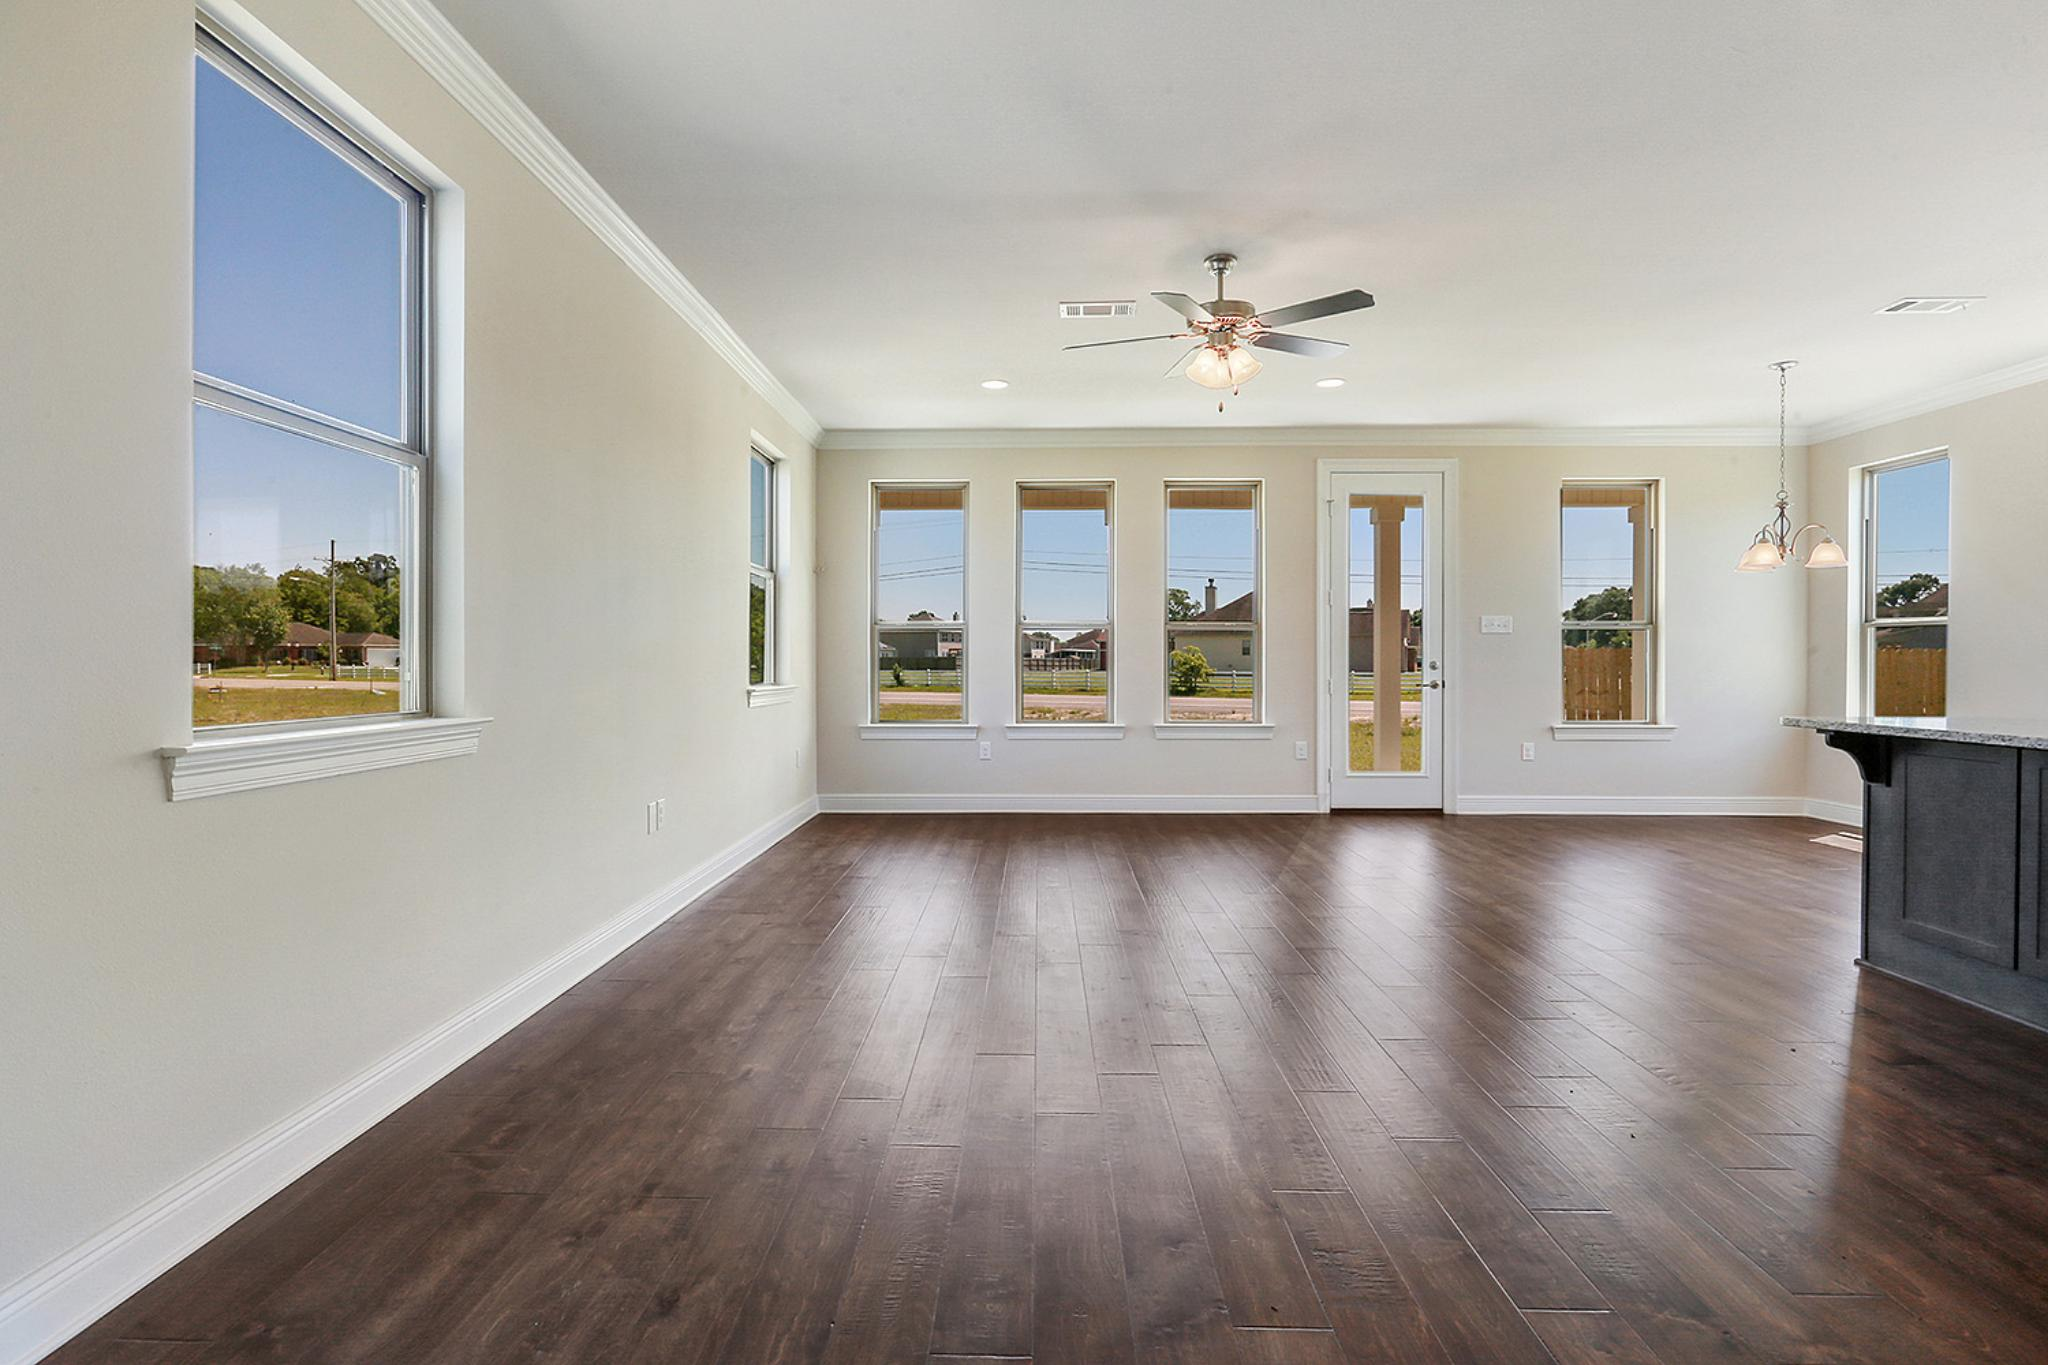 9583 Catalpa Loop | New Home Waggaman, LA | Sunrise Homes